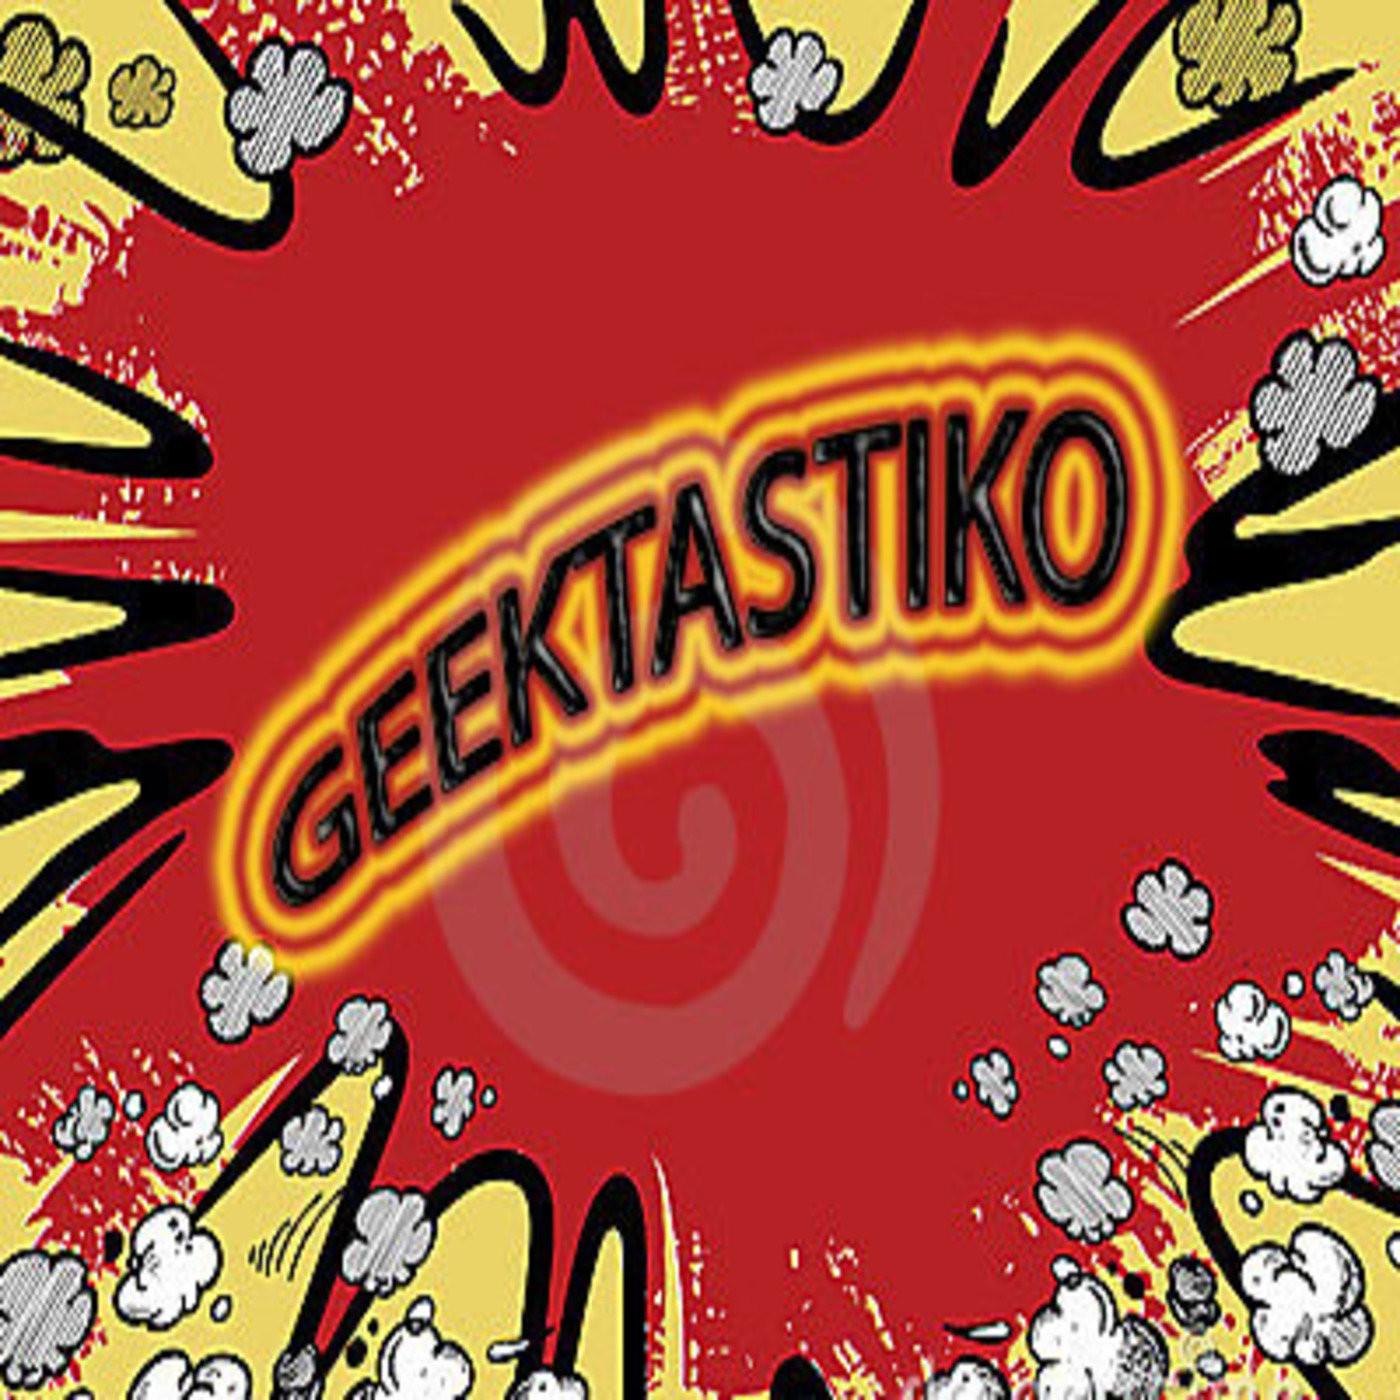 <![CDATA[Geektastiko Podcast]]>